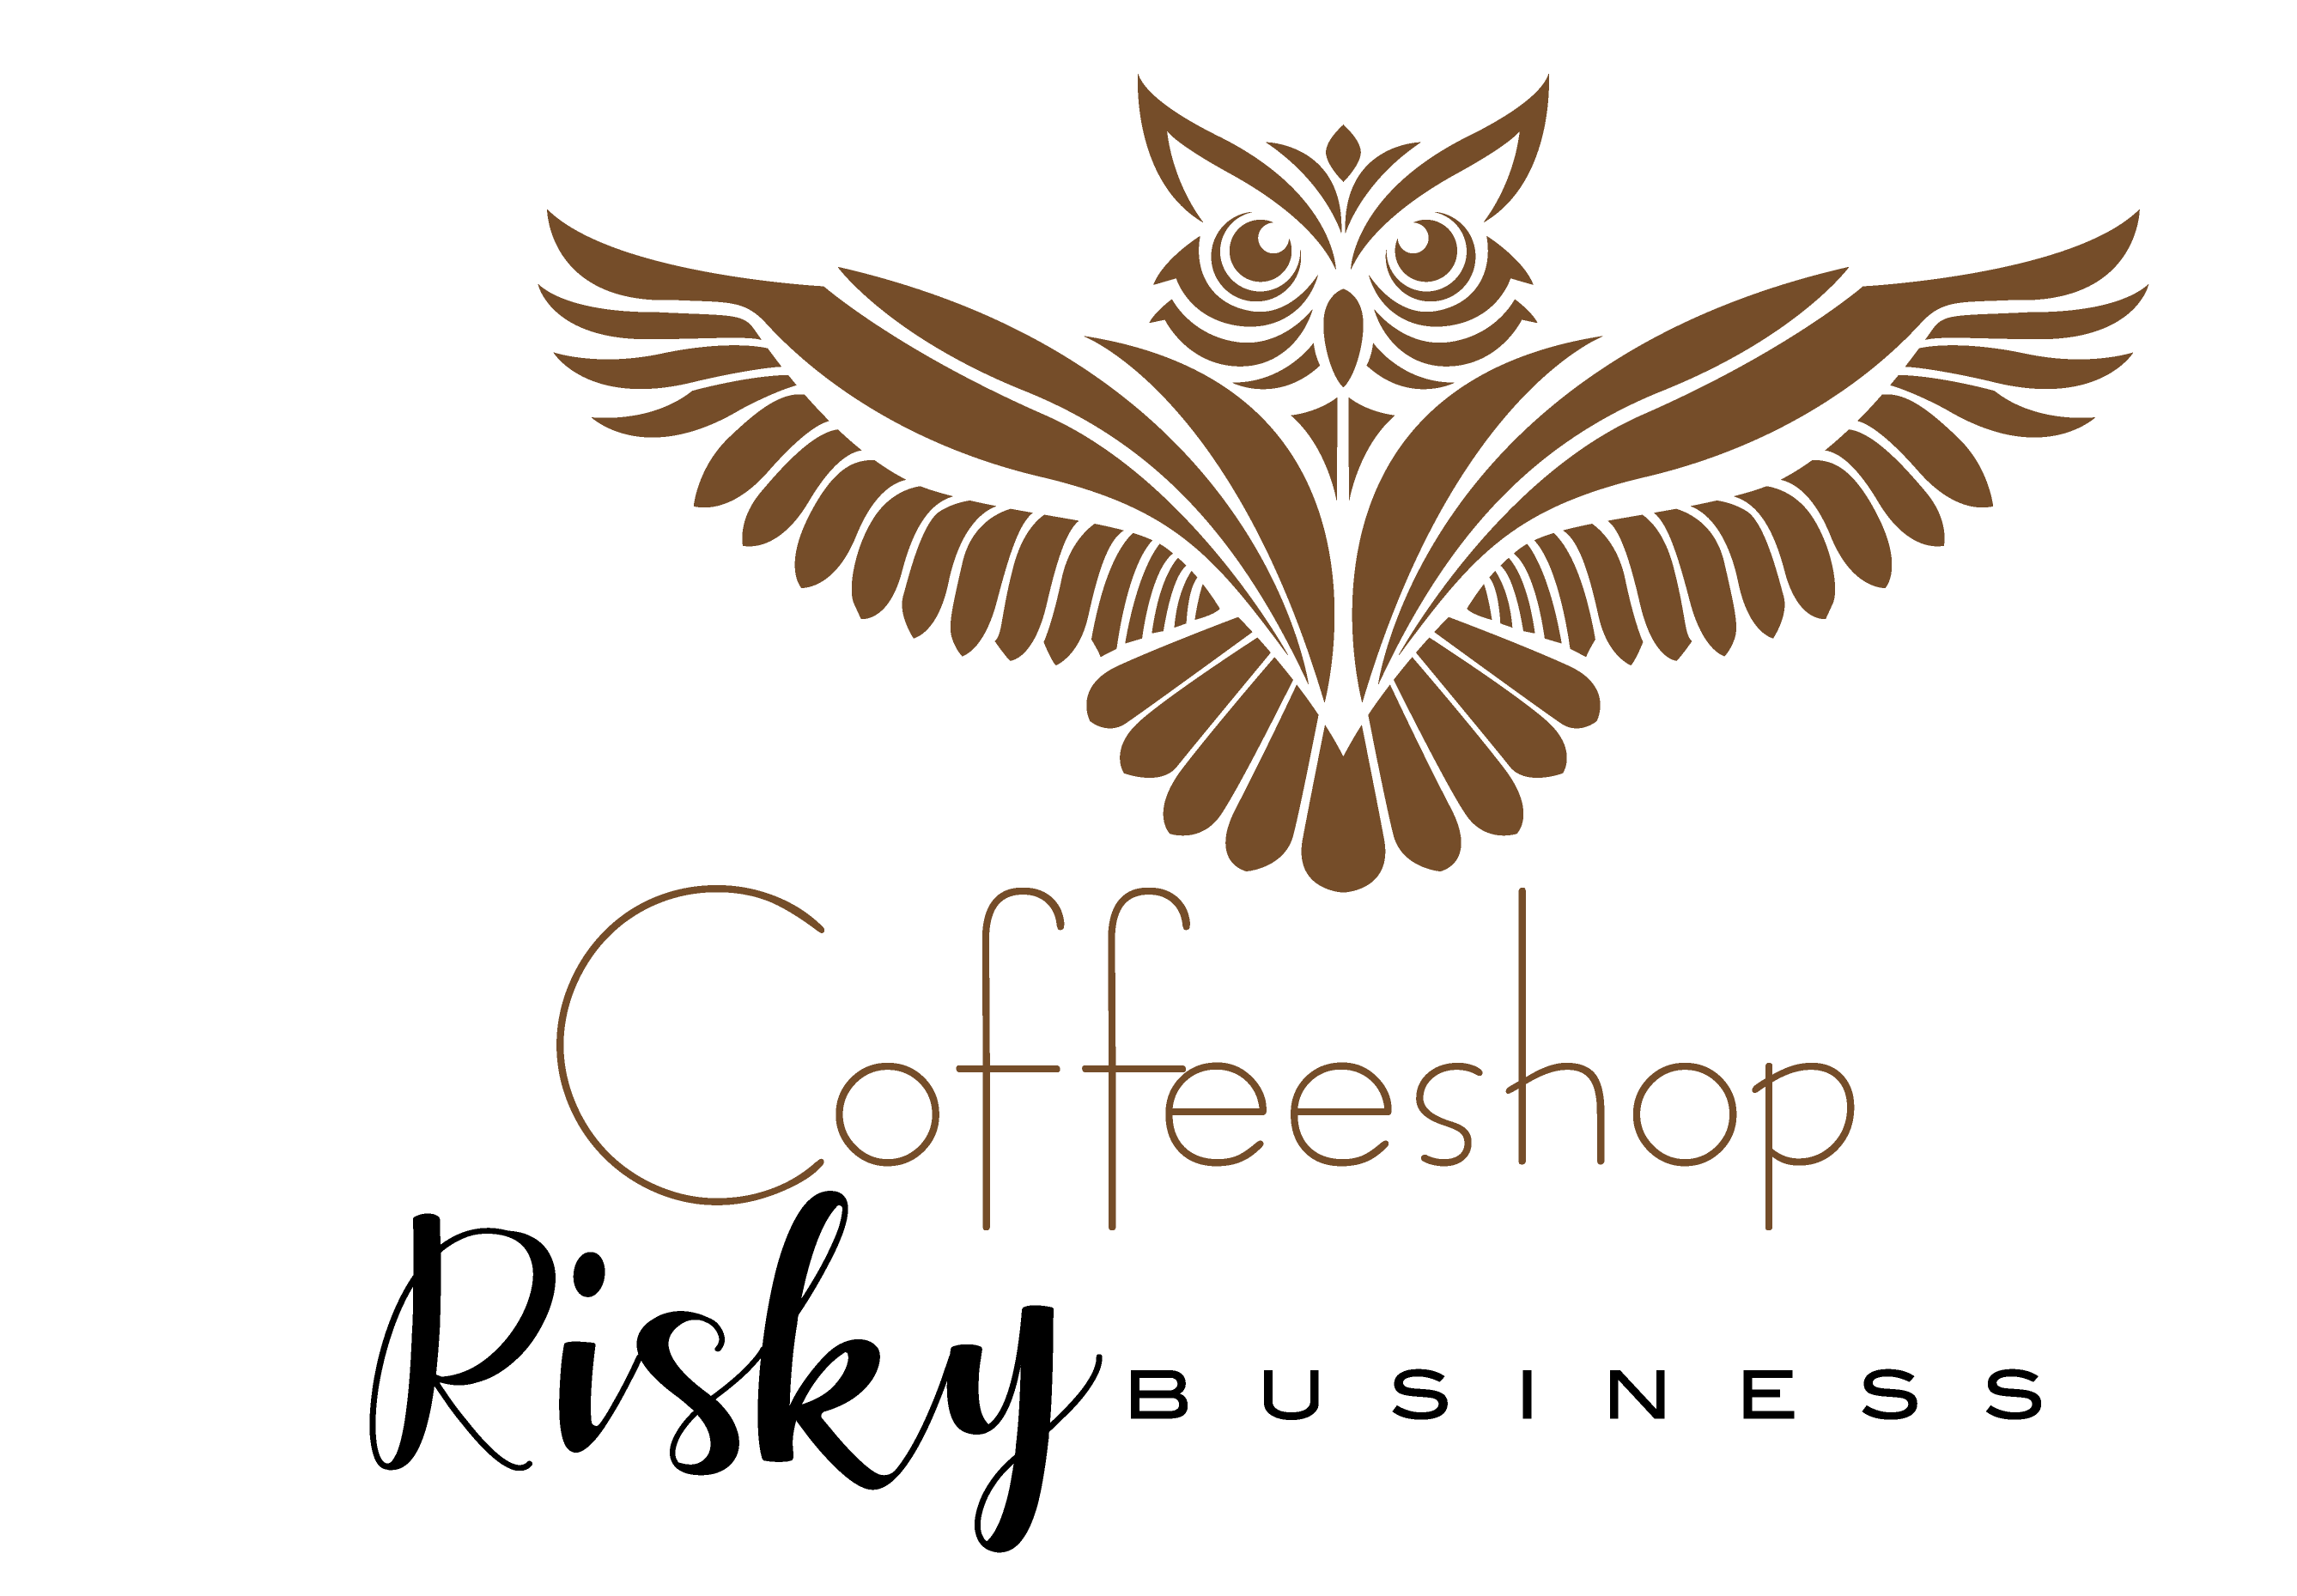 Coffeeshop Risky Business